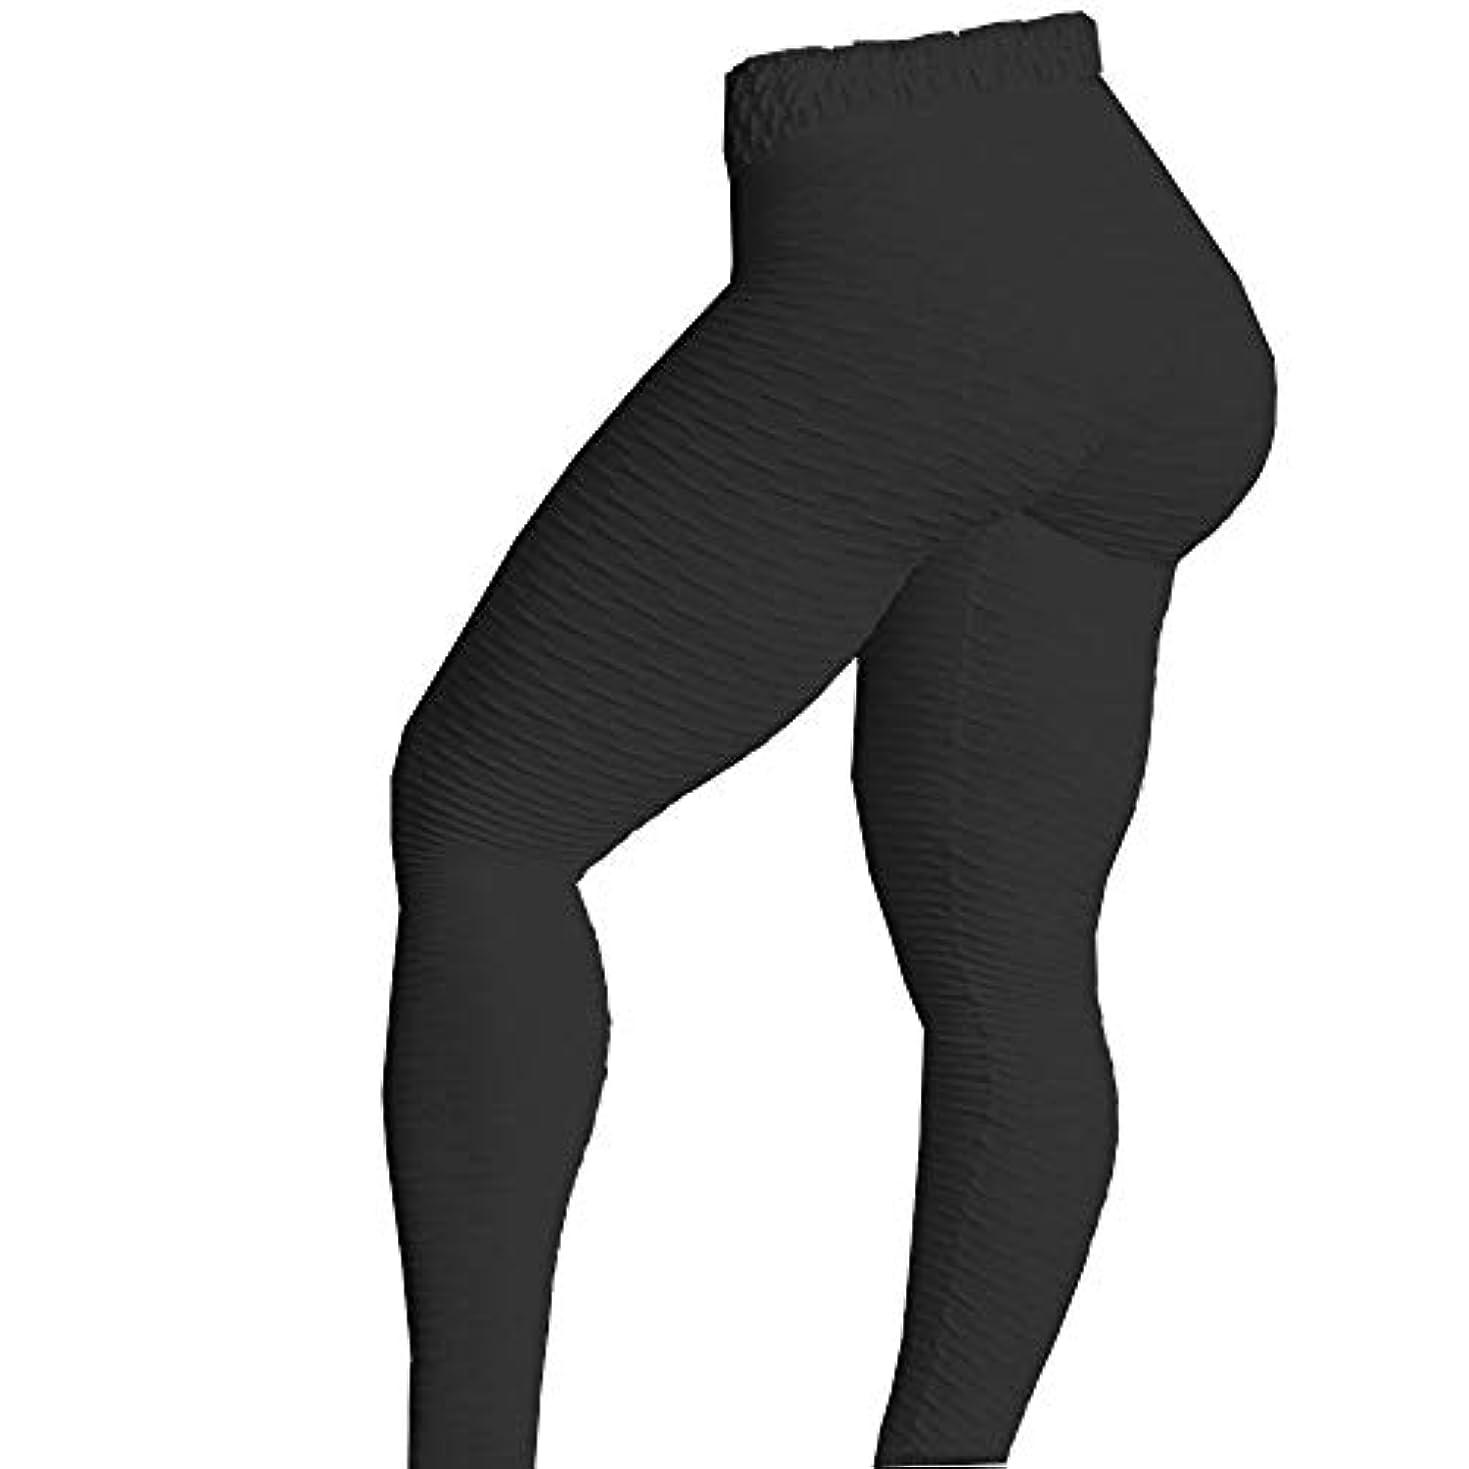 MIFAN パンツ女性、ハイウエストパンツ、スキニーパンツ、ヨガレギンス、女性のズボン、ランニングパンツ、スポーツウェア